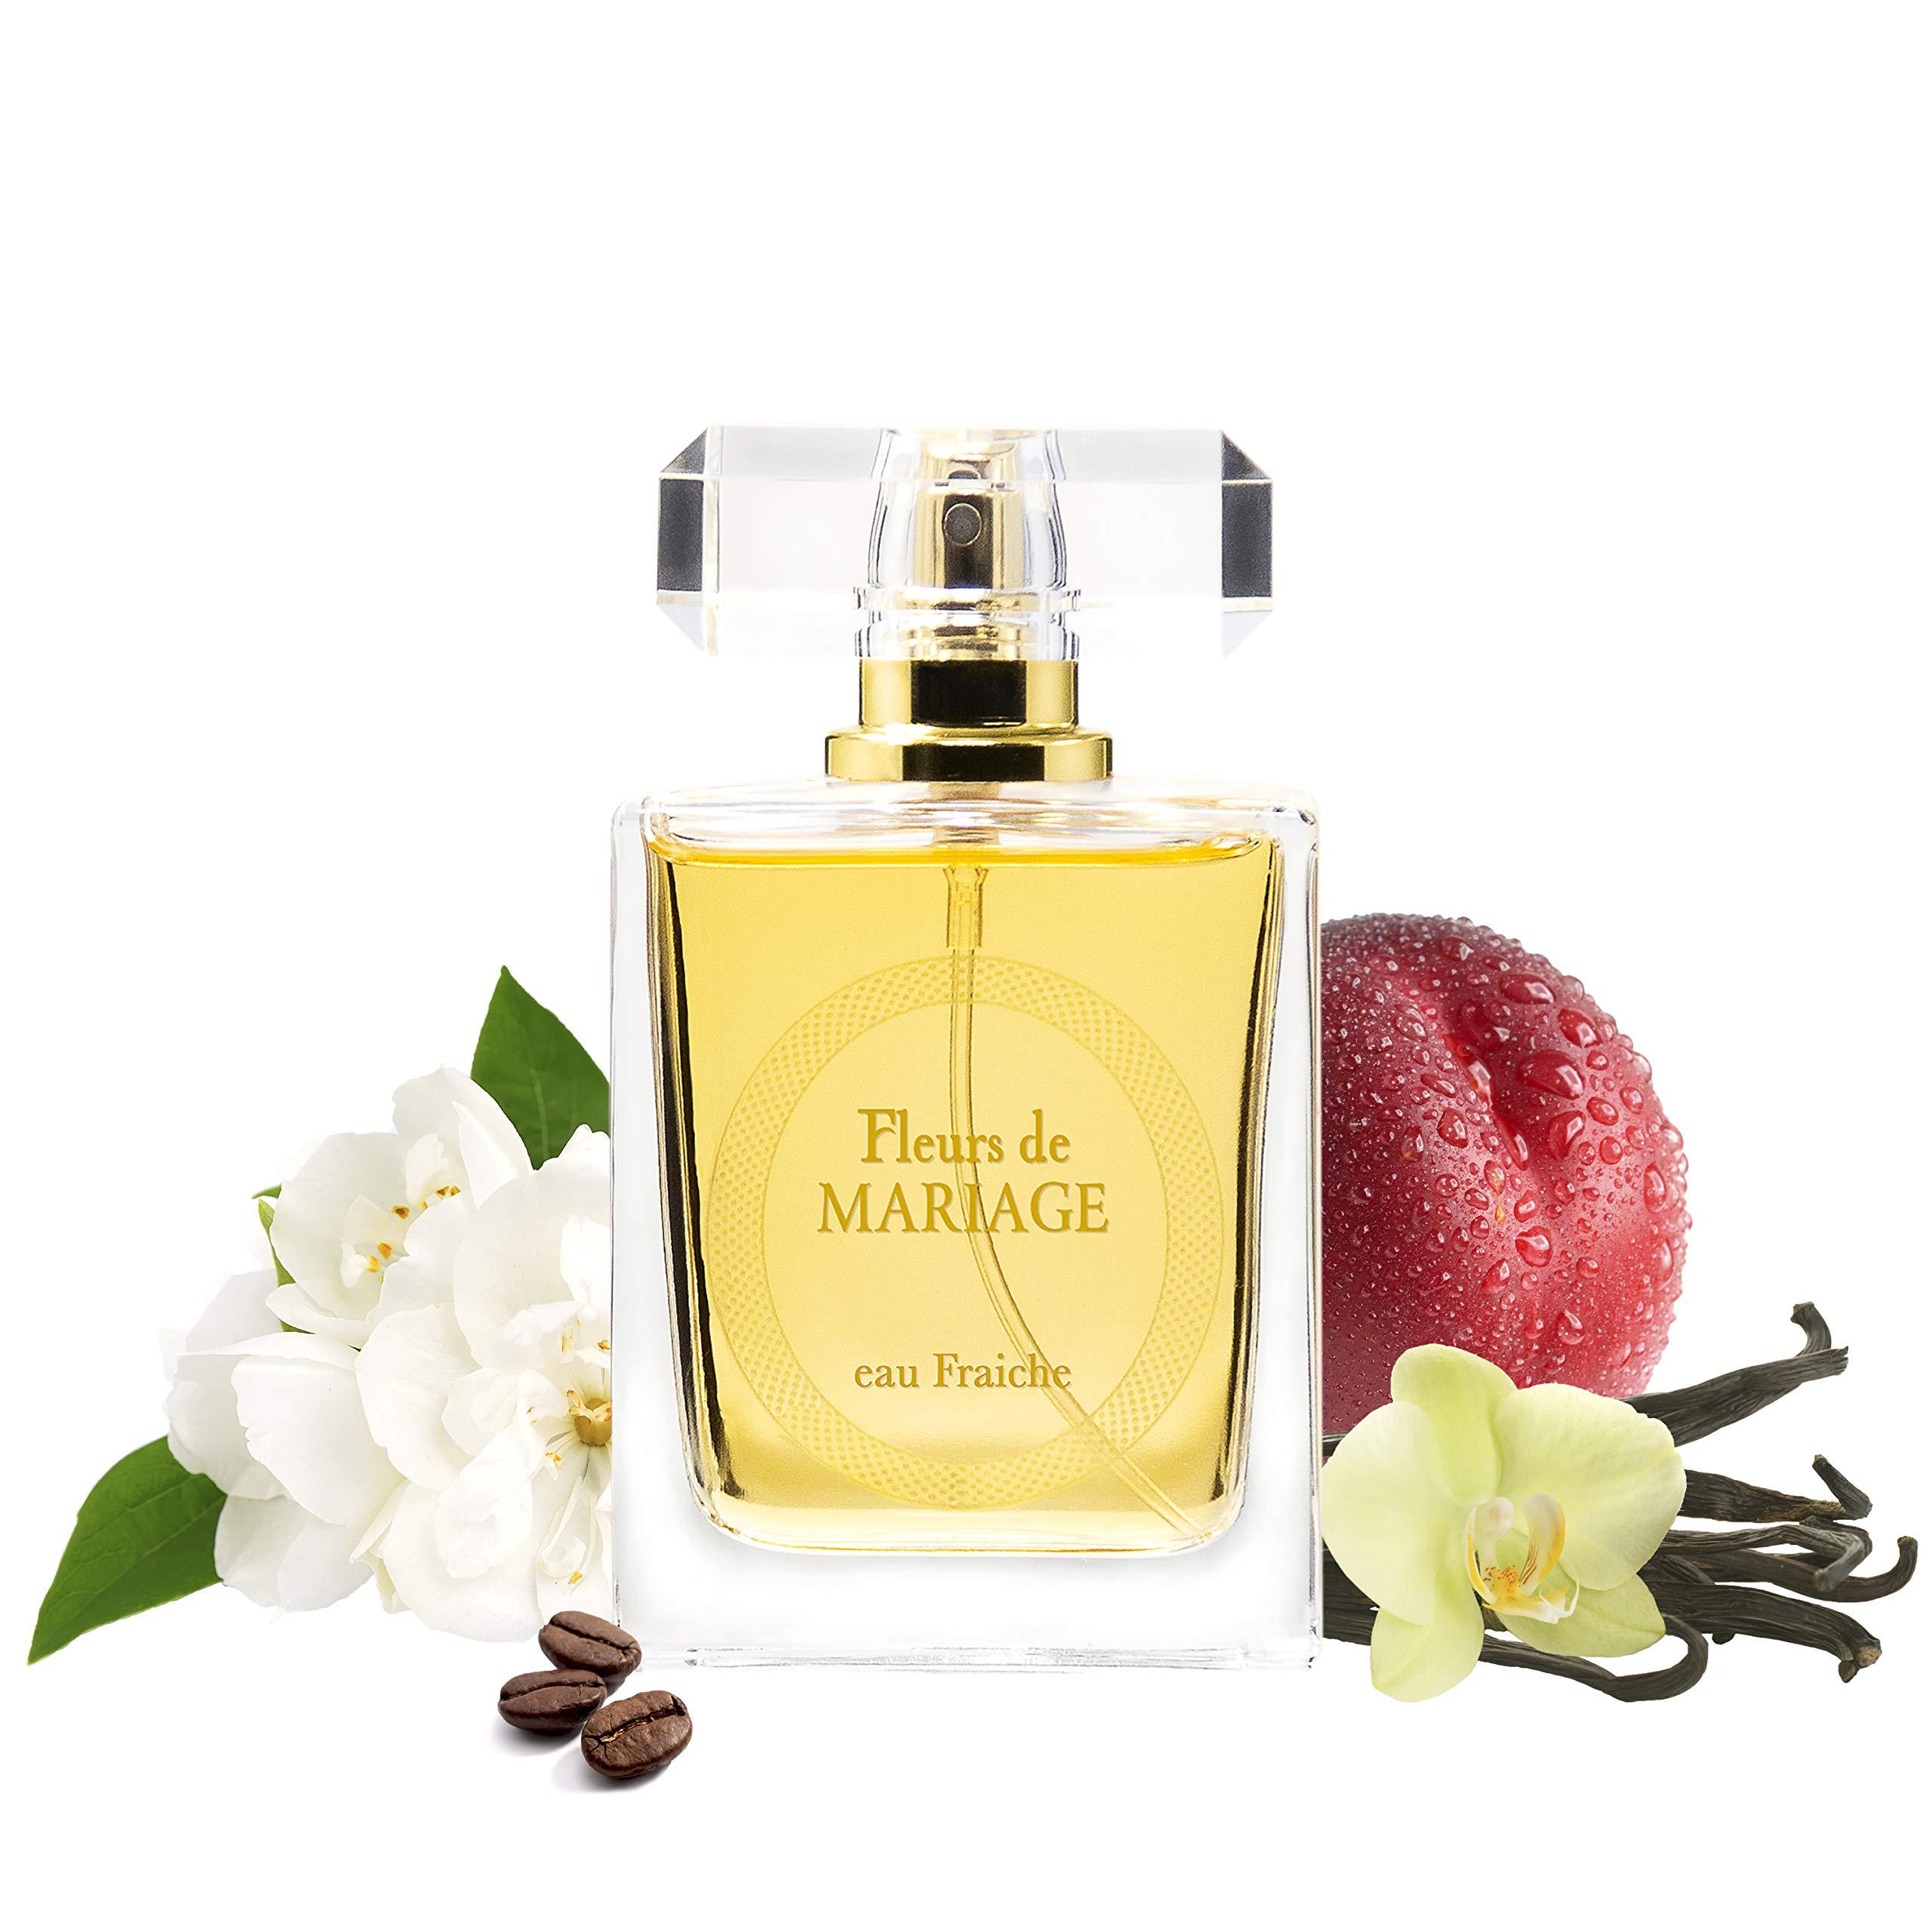 Fleurs de MARIAGE Eau Fraiche/Fresh Fragrant Water Spray for Women, 50 ml - Light Fragrance for Her, Good Gift Idea by SERGIO NERO